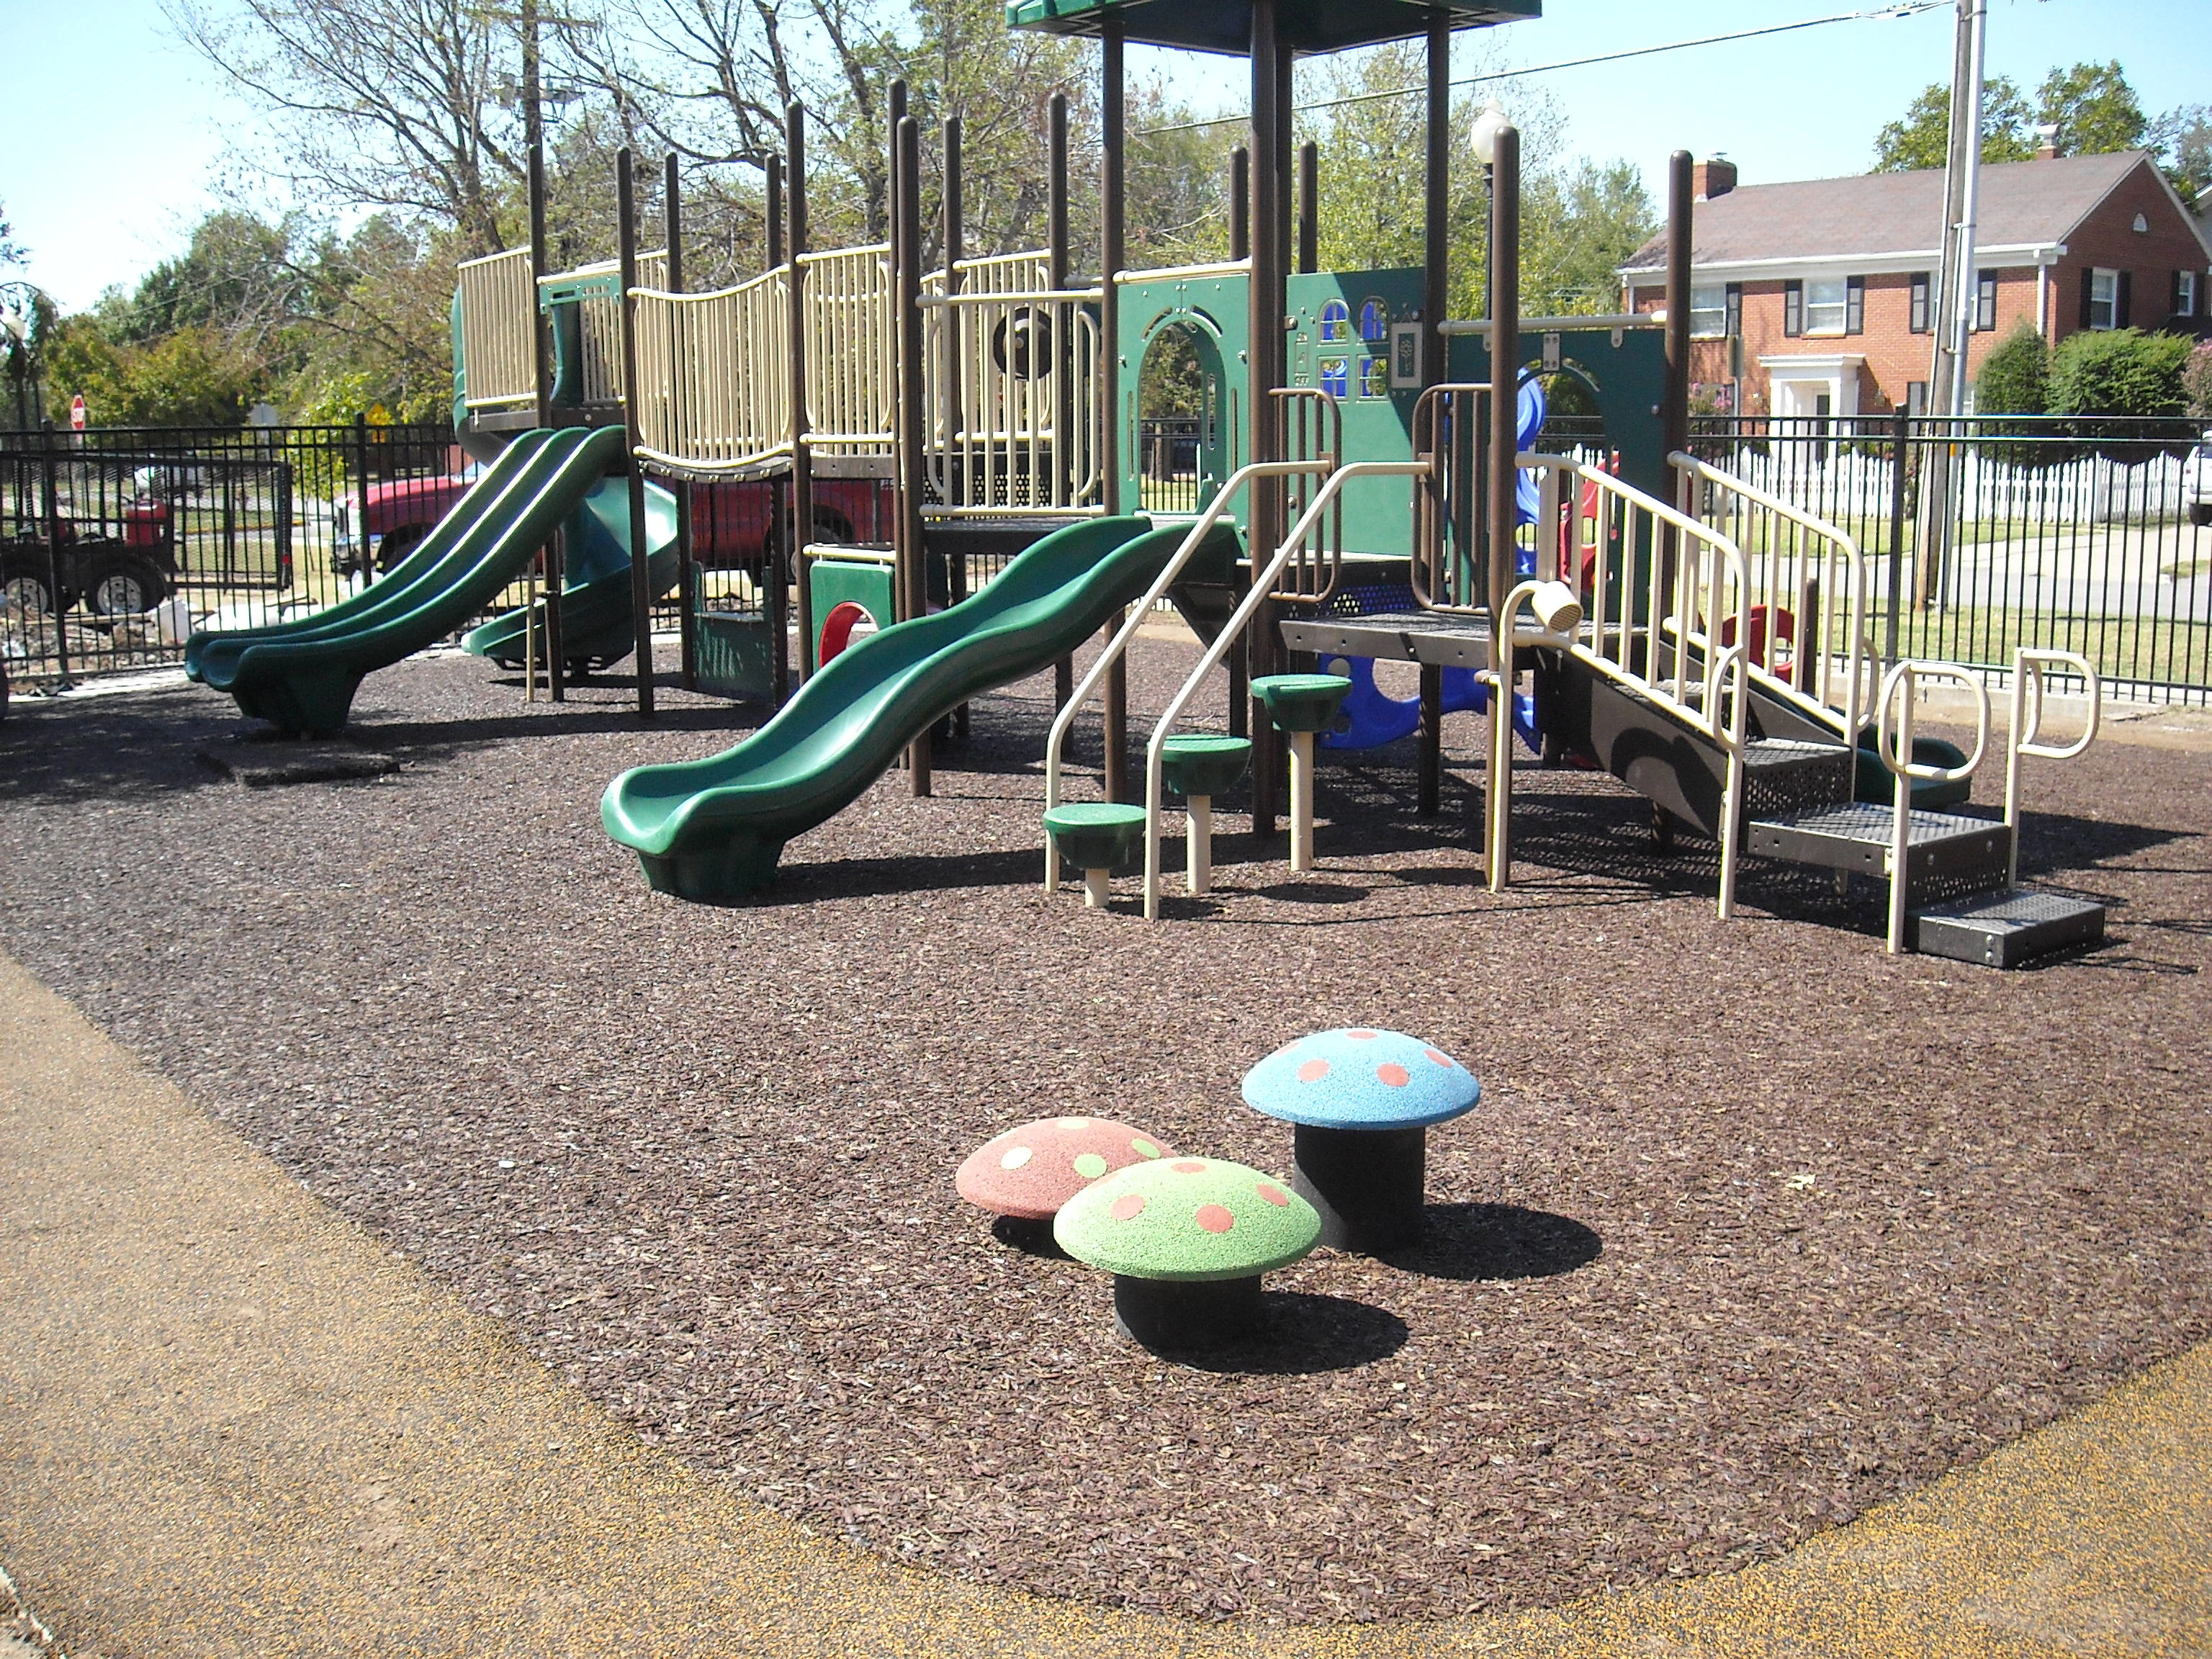 Noahs Park And Playgrounds Llc Edmond Oklahoma Ok